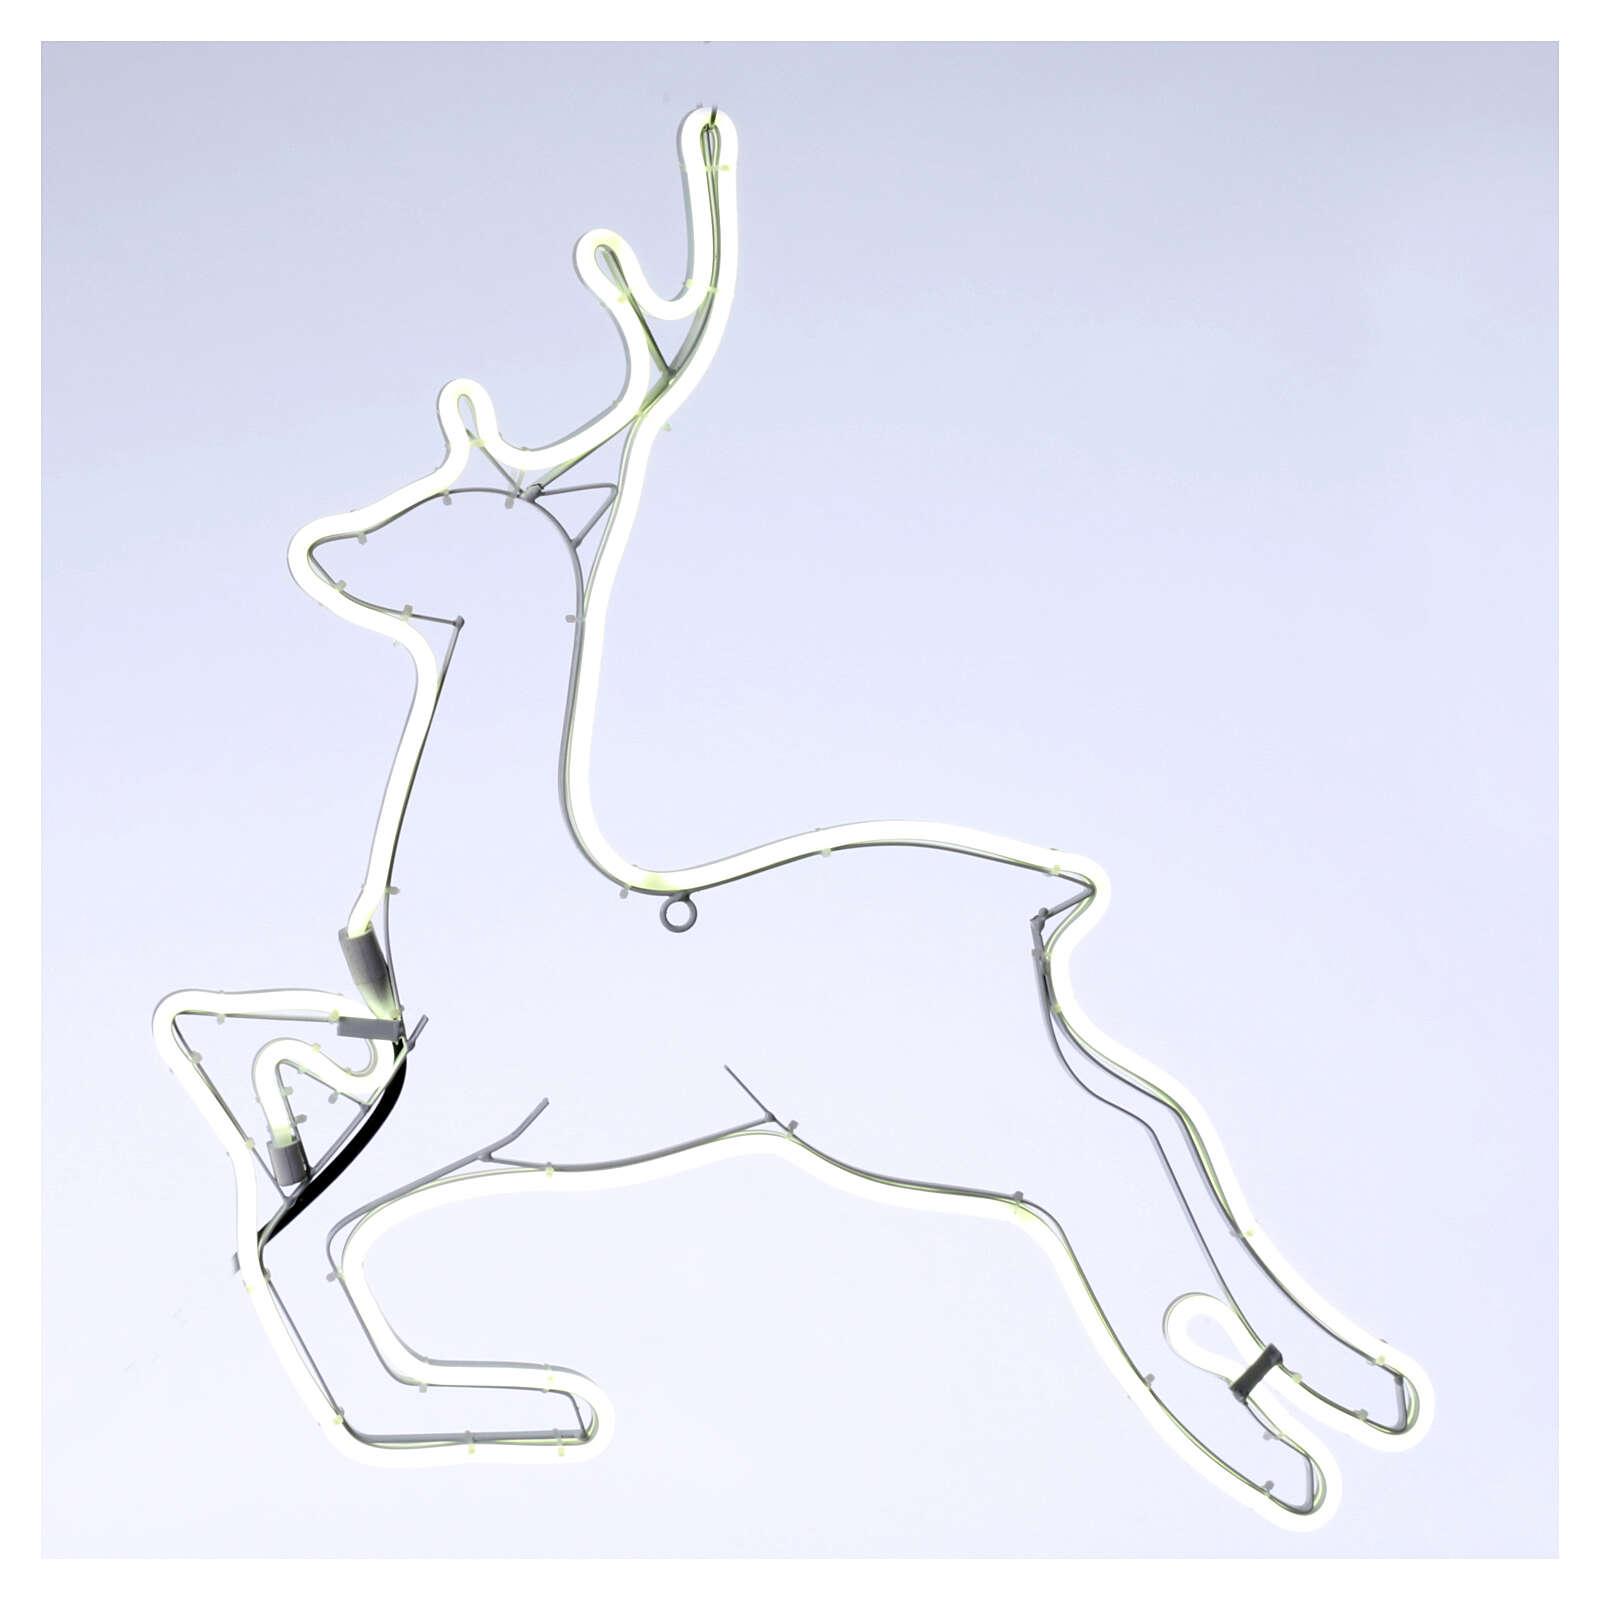 Illuminated reindeer 360 ice white leds 57x57 cm external and internal use 3